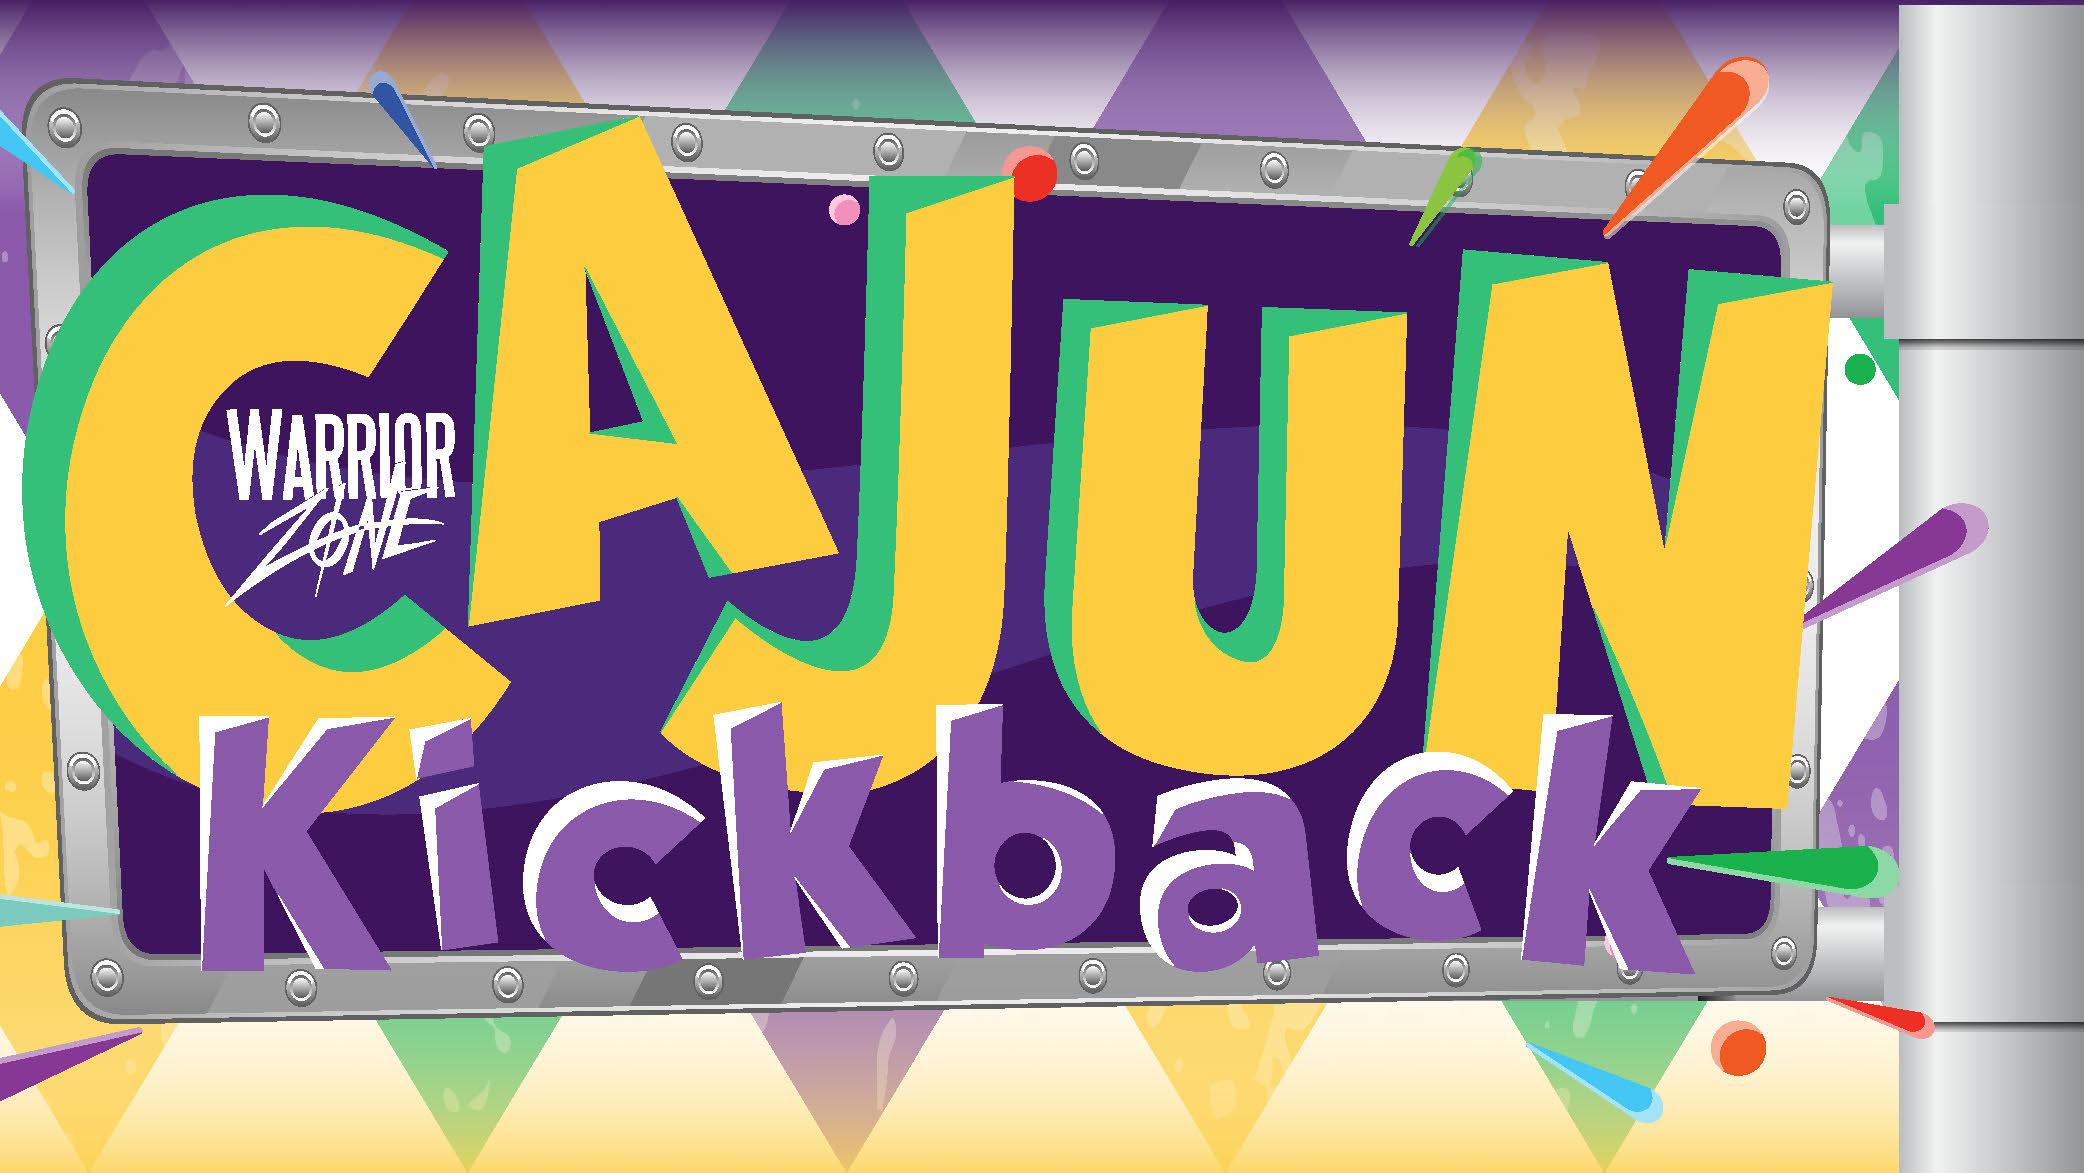 Cajun Kickback